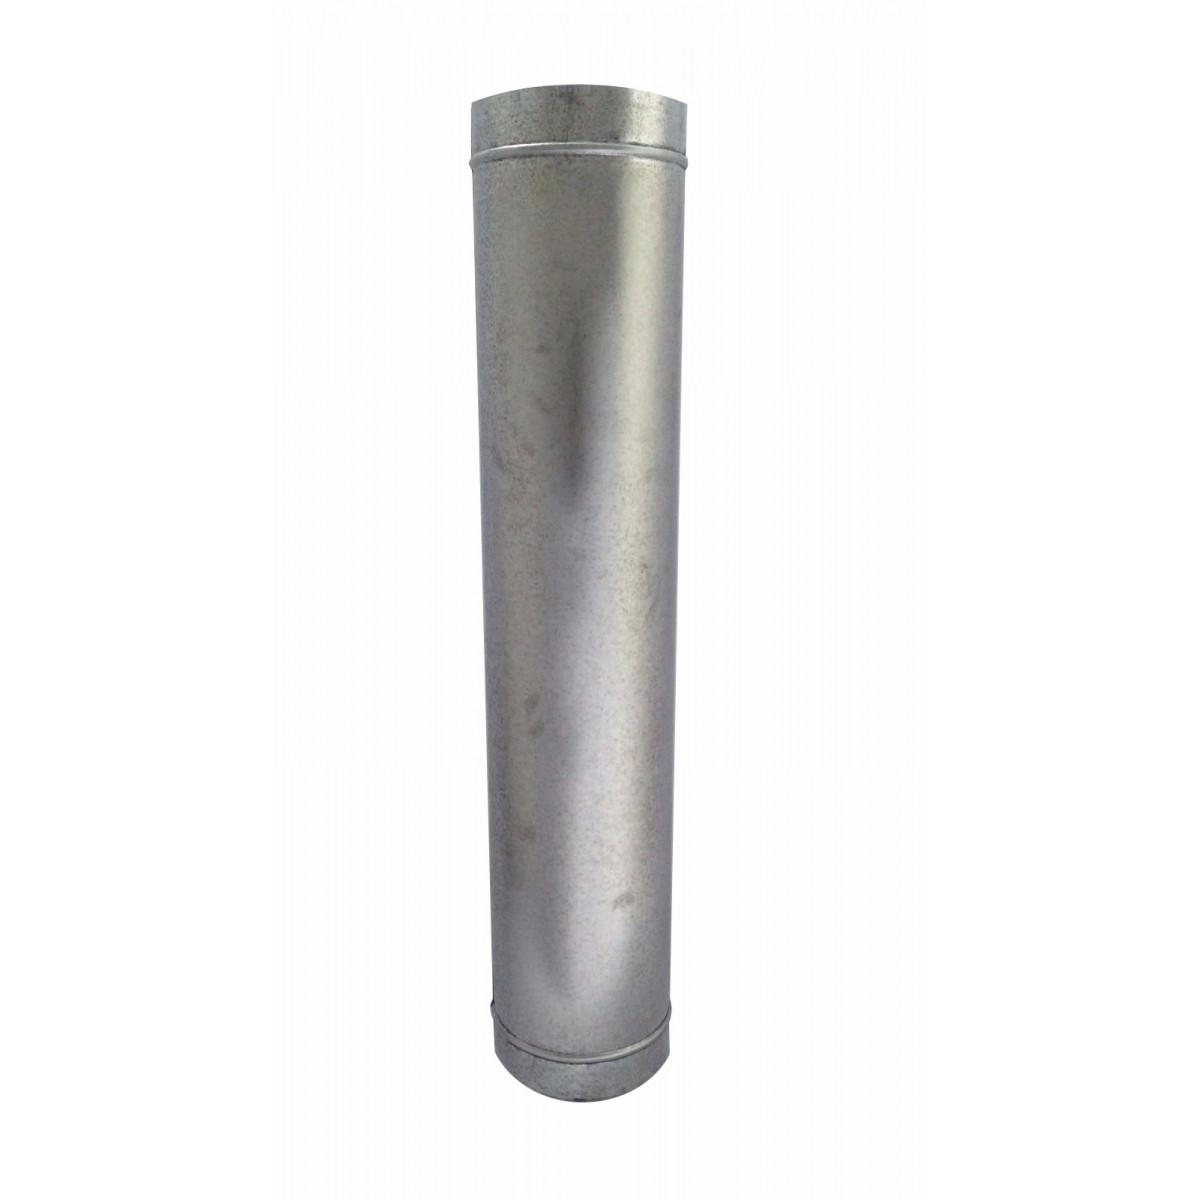 1 metro de duto galvanizado para chaminé de 40 mm de diâmetro  - Galvocalhas